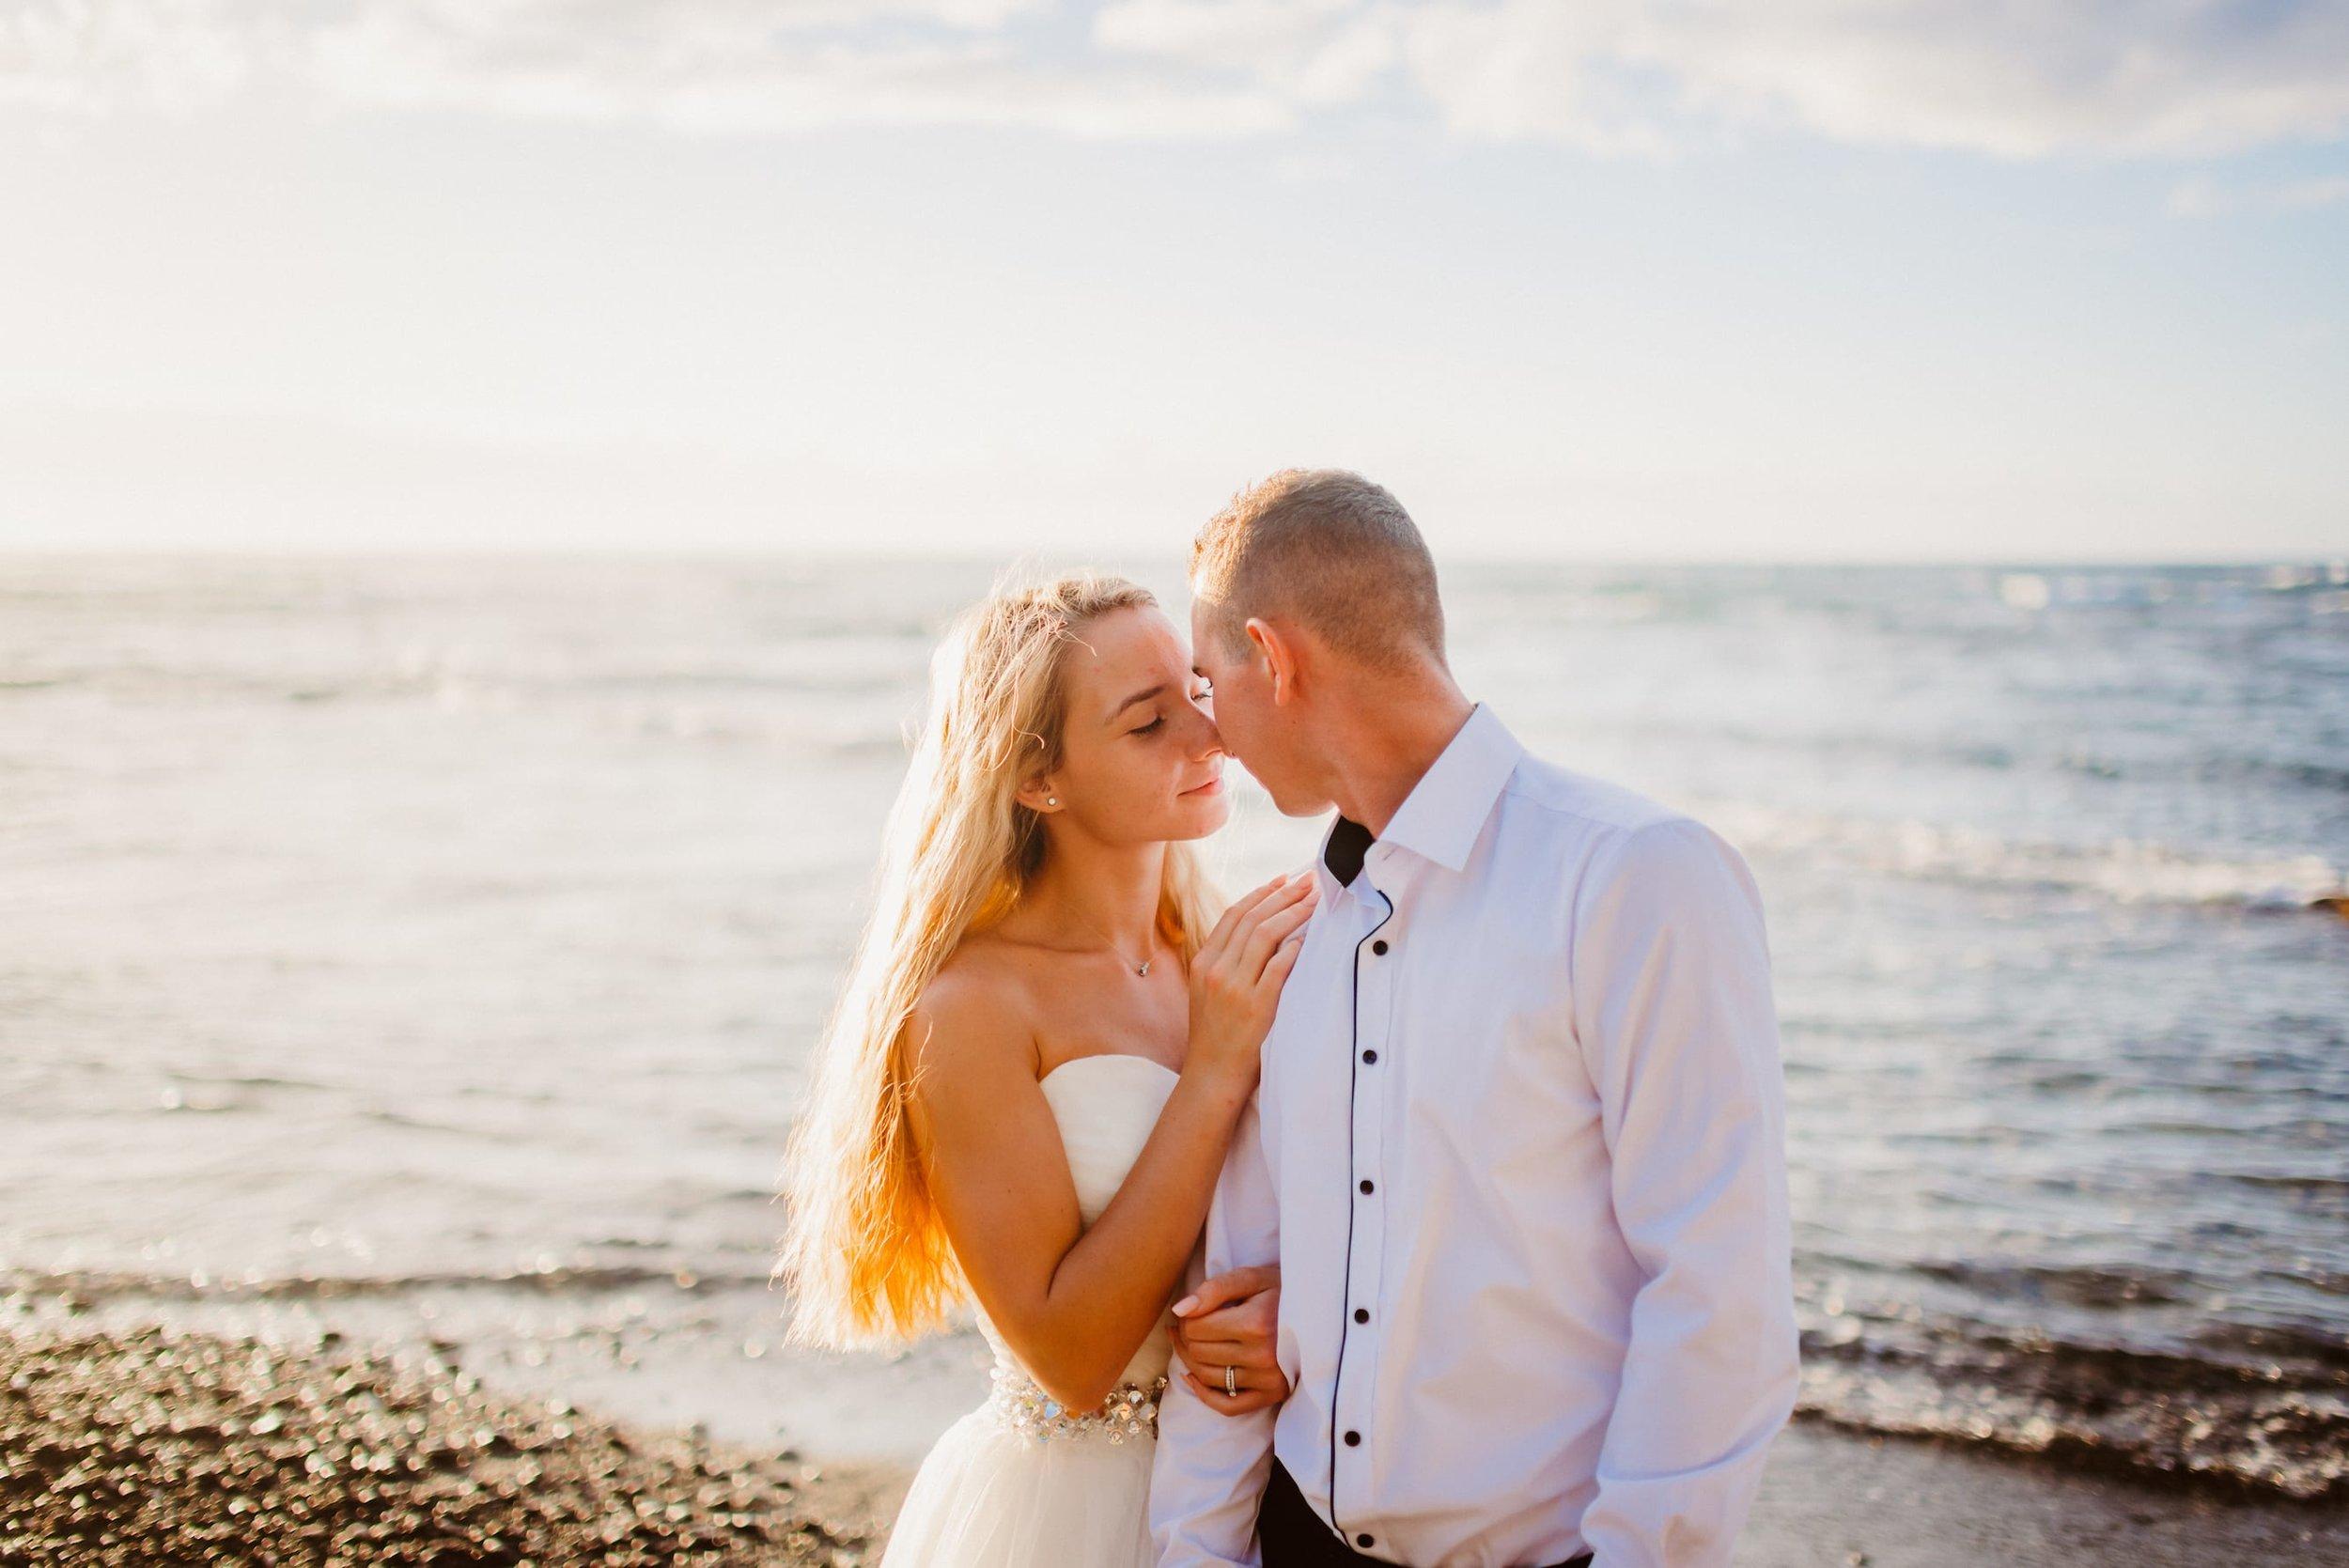 Big-Island-Elopement-Private-Wedding-Hawaii-Beach-07.jpg